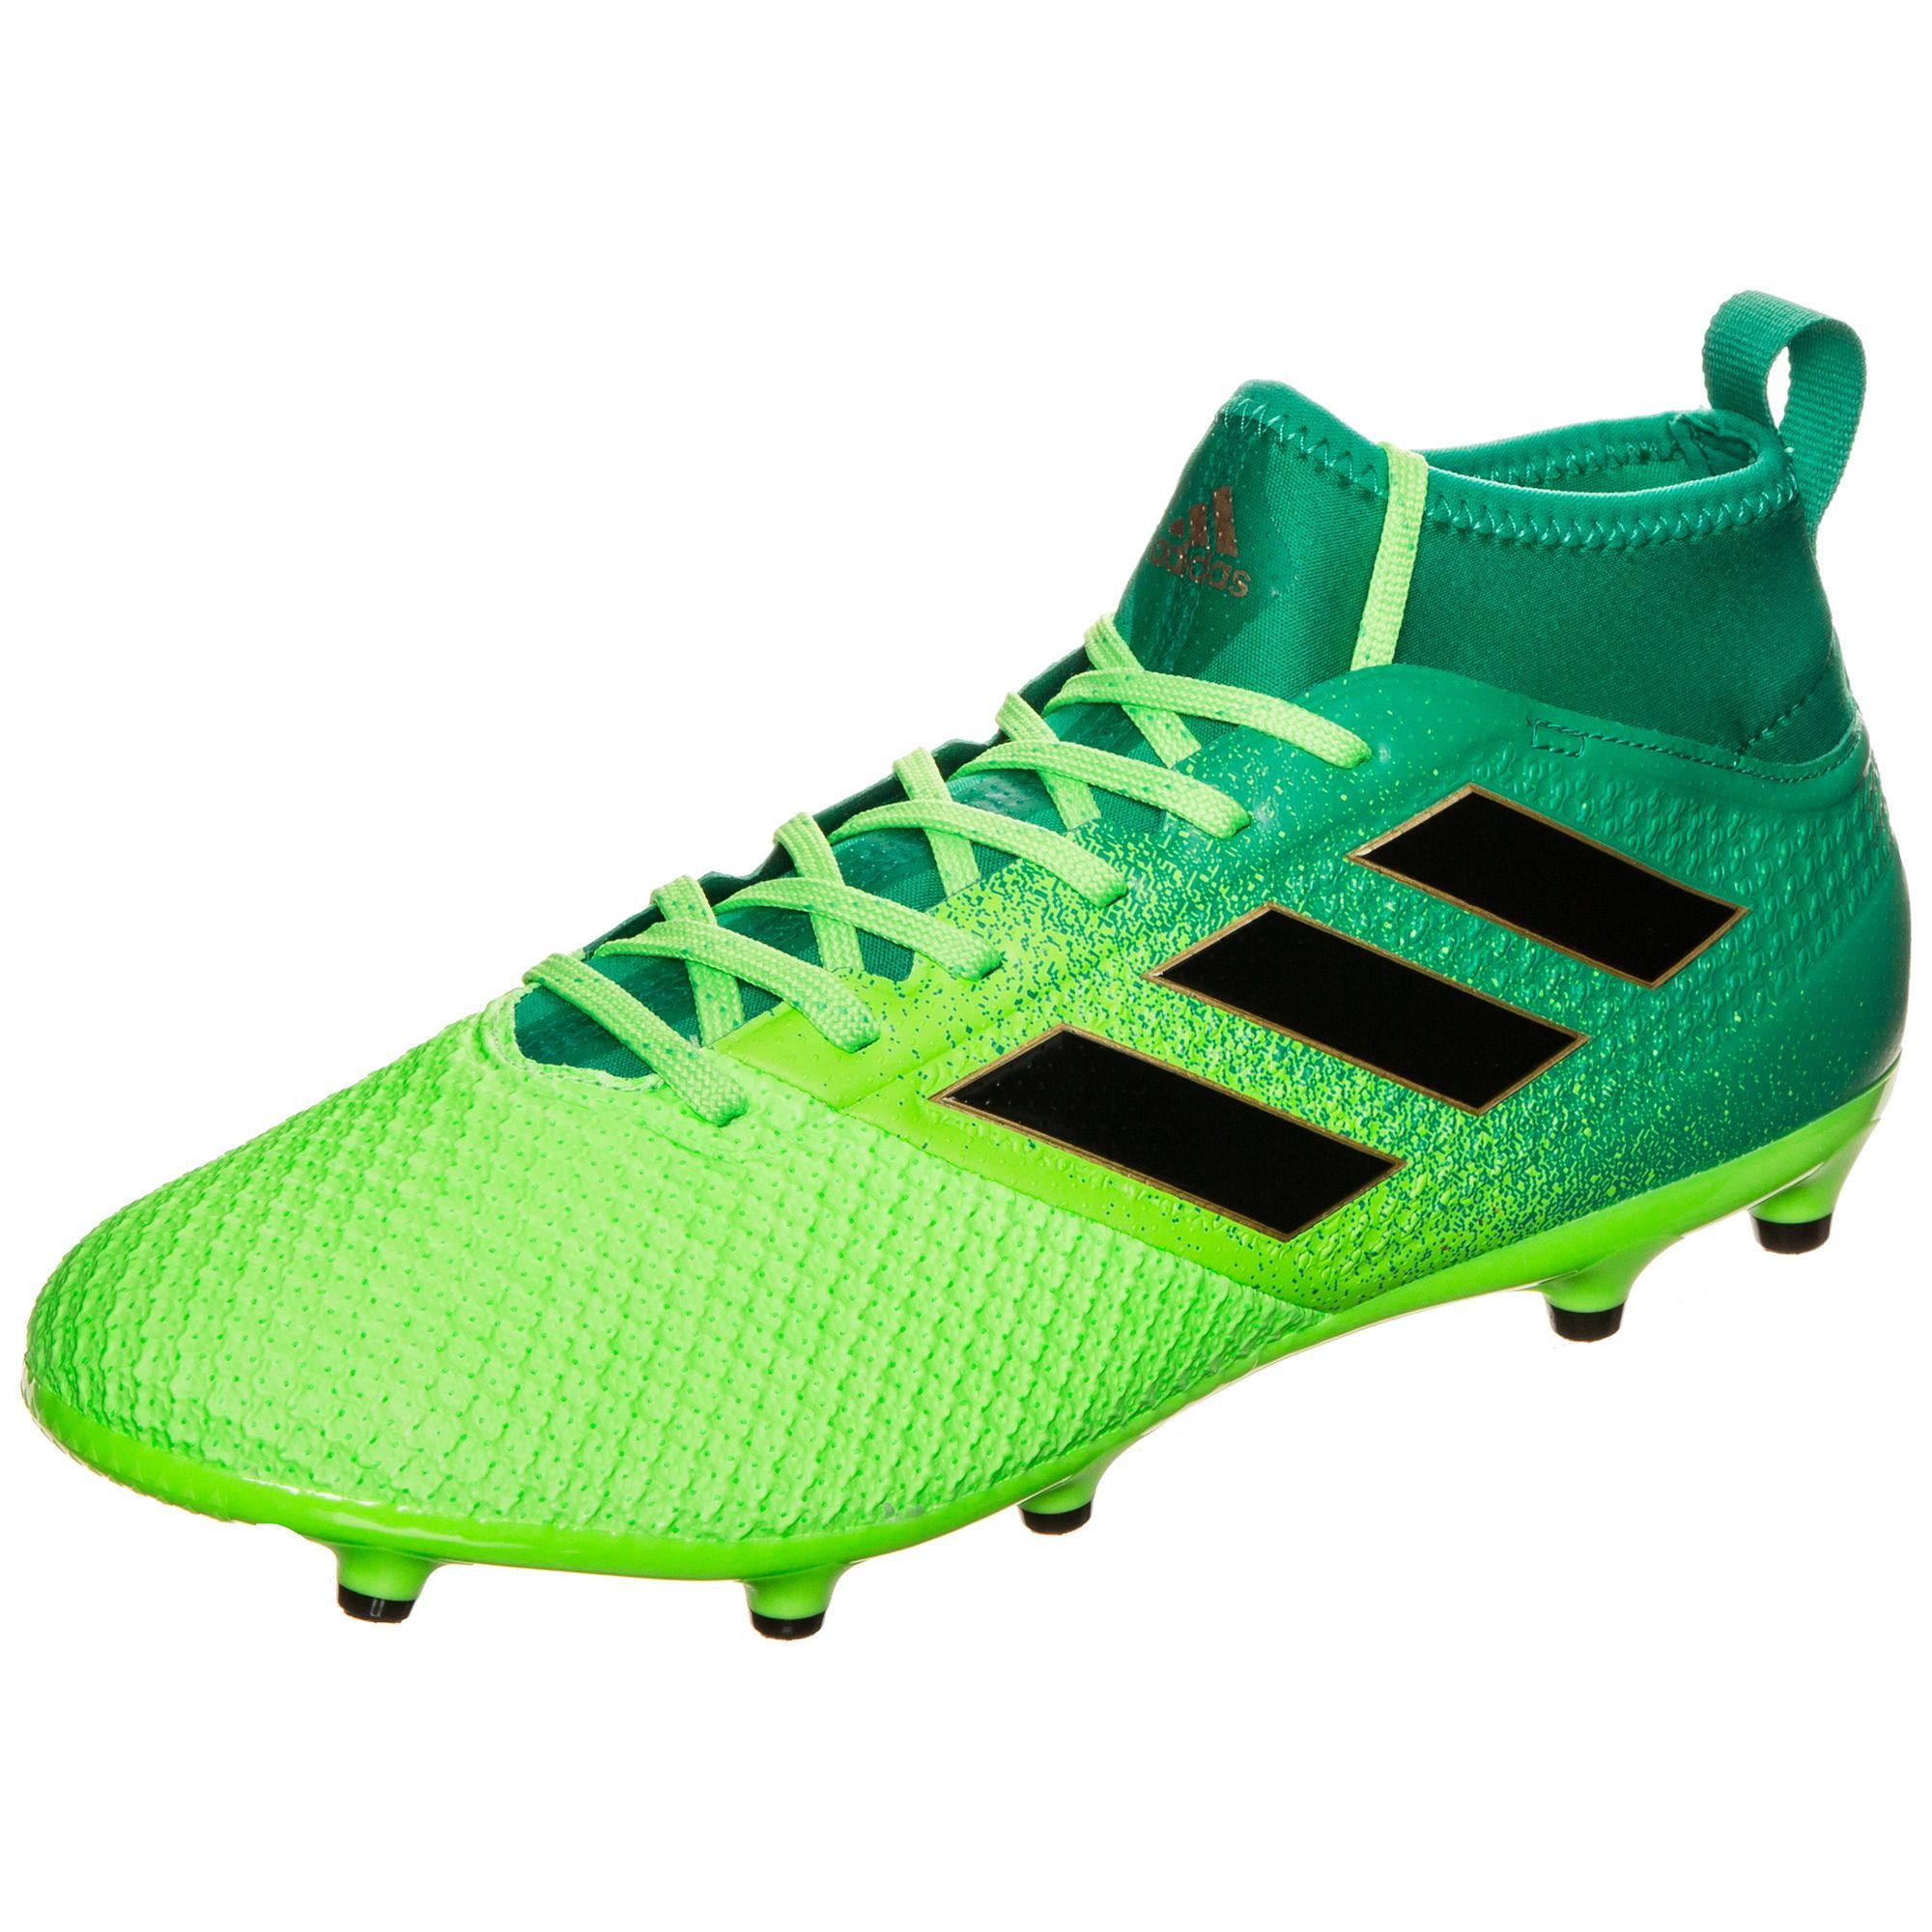 ADIDAS PERFORMANCE adidas Performance ACE 17.3 Primemesh FG Fußballschuh Herren